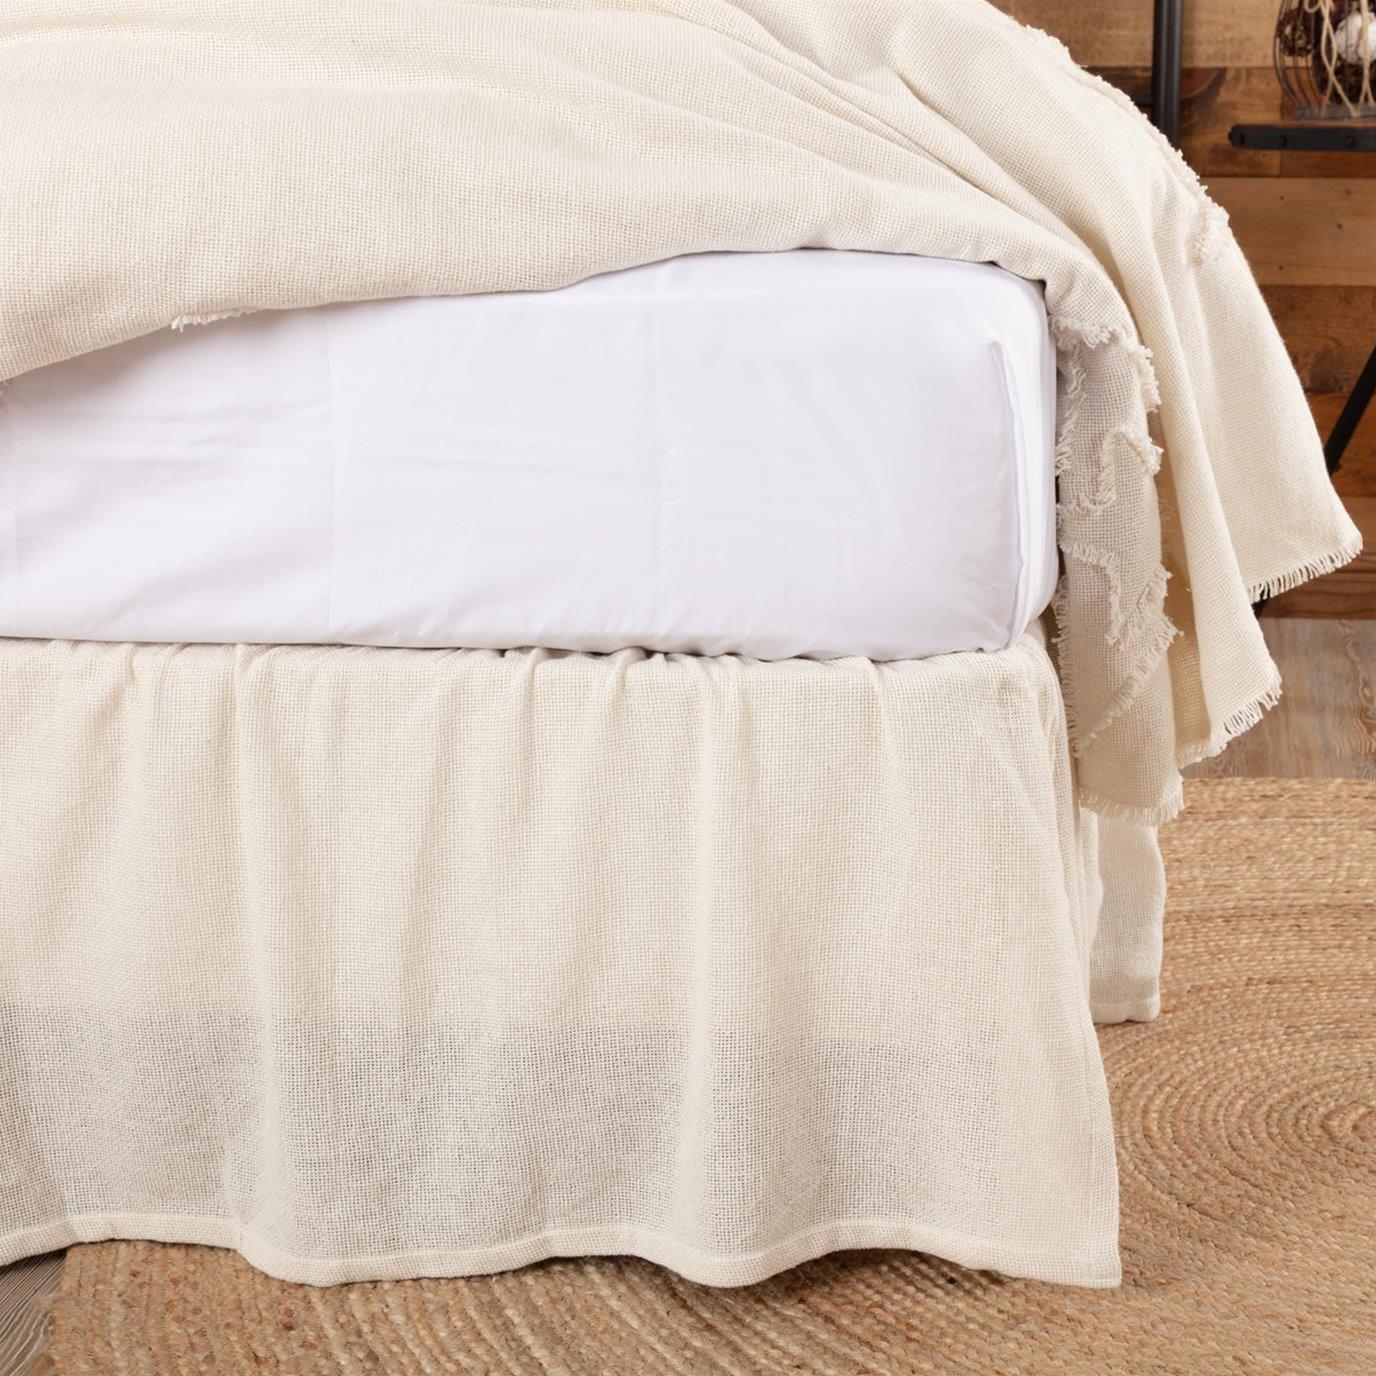 Burlap Antique White Ruffled Twin Bed Skirt 39x76x16